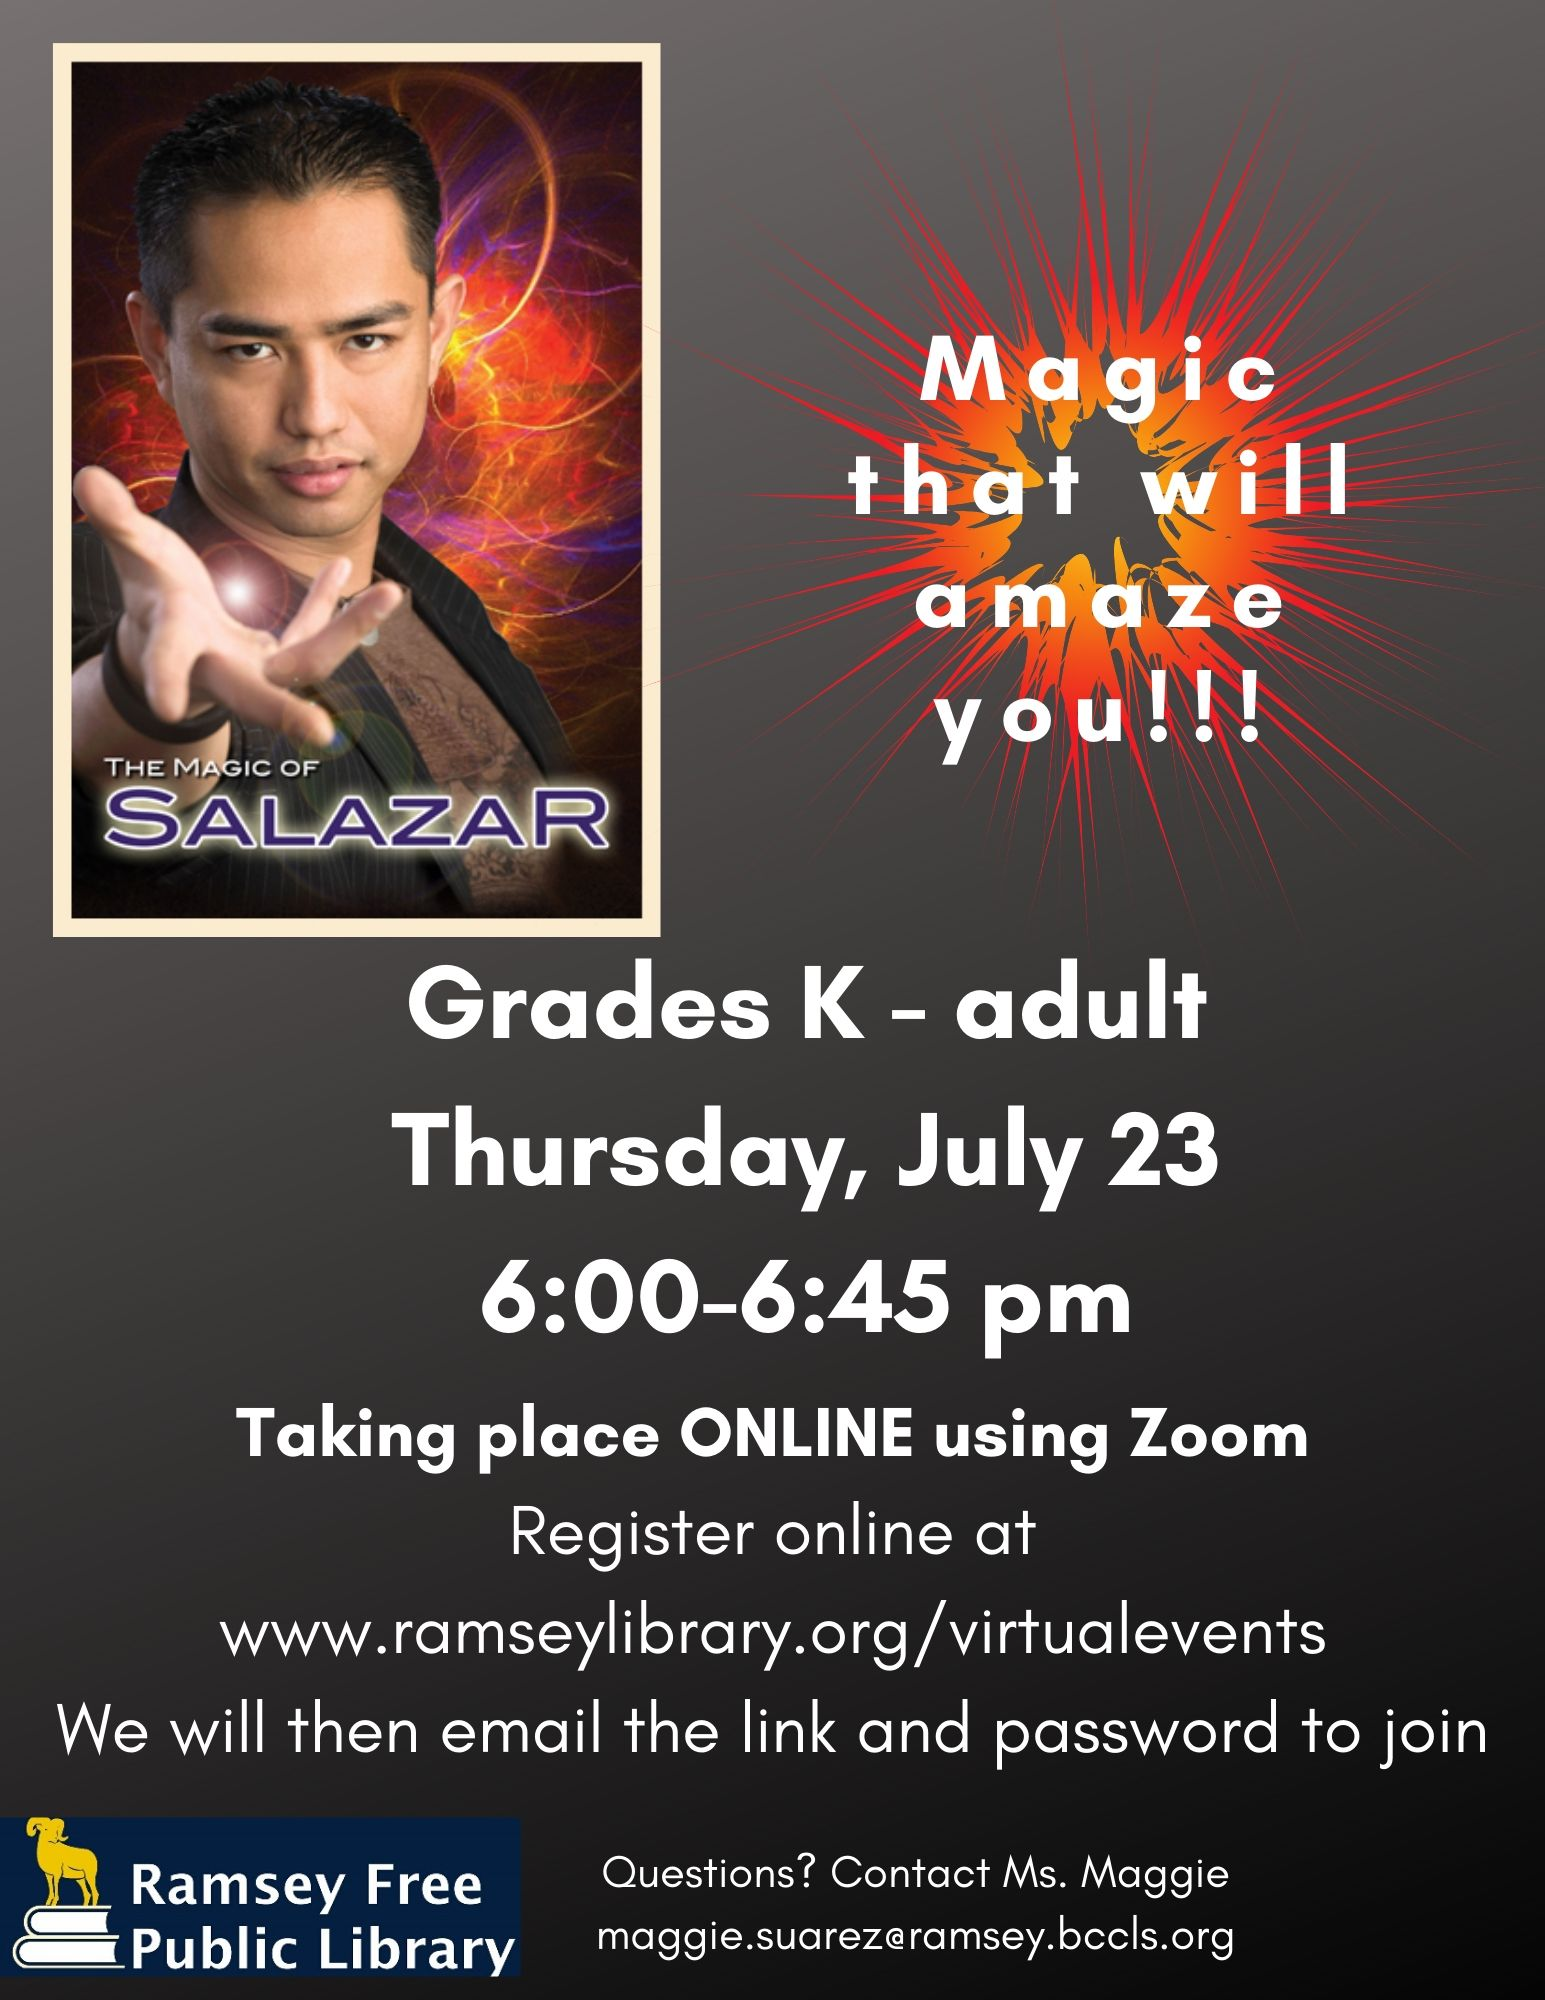 Summer 2020 Magic Show